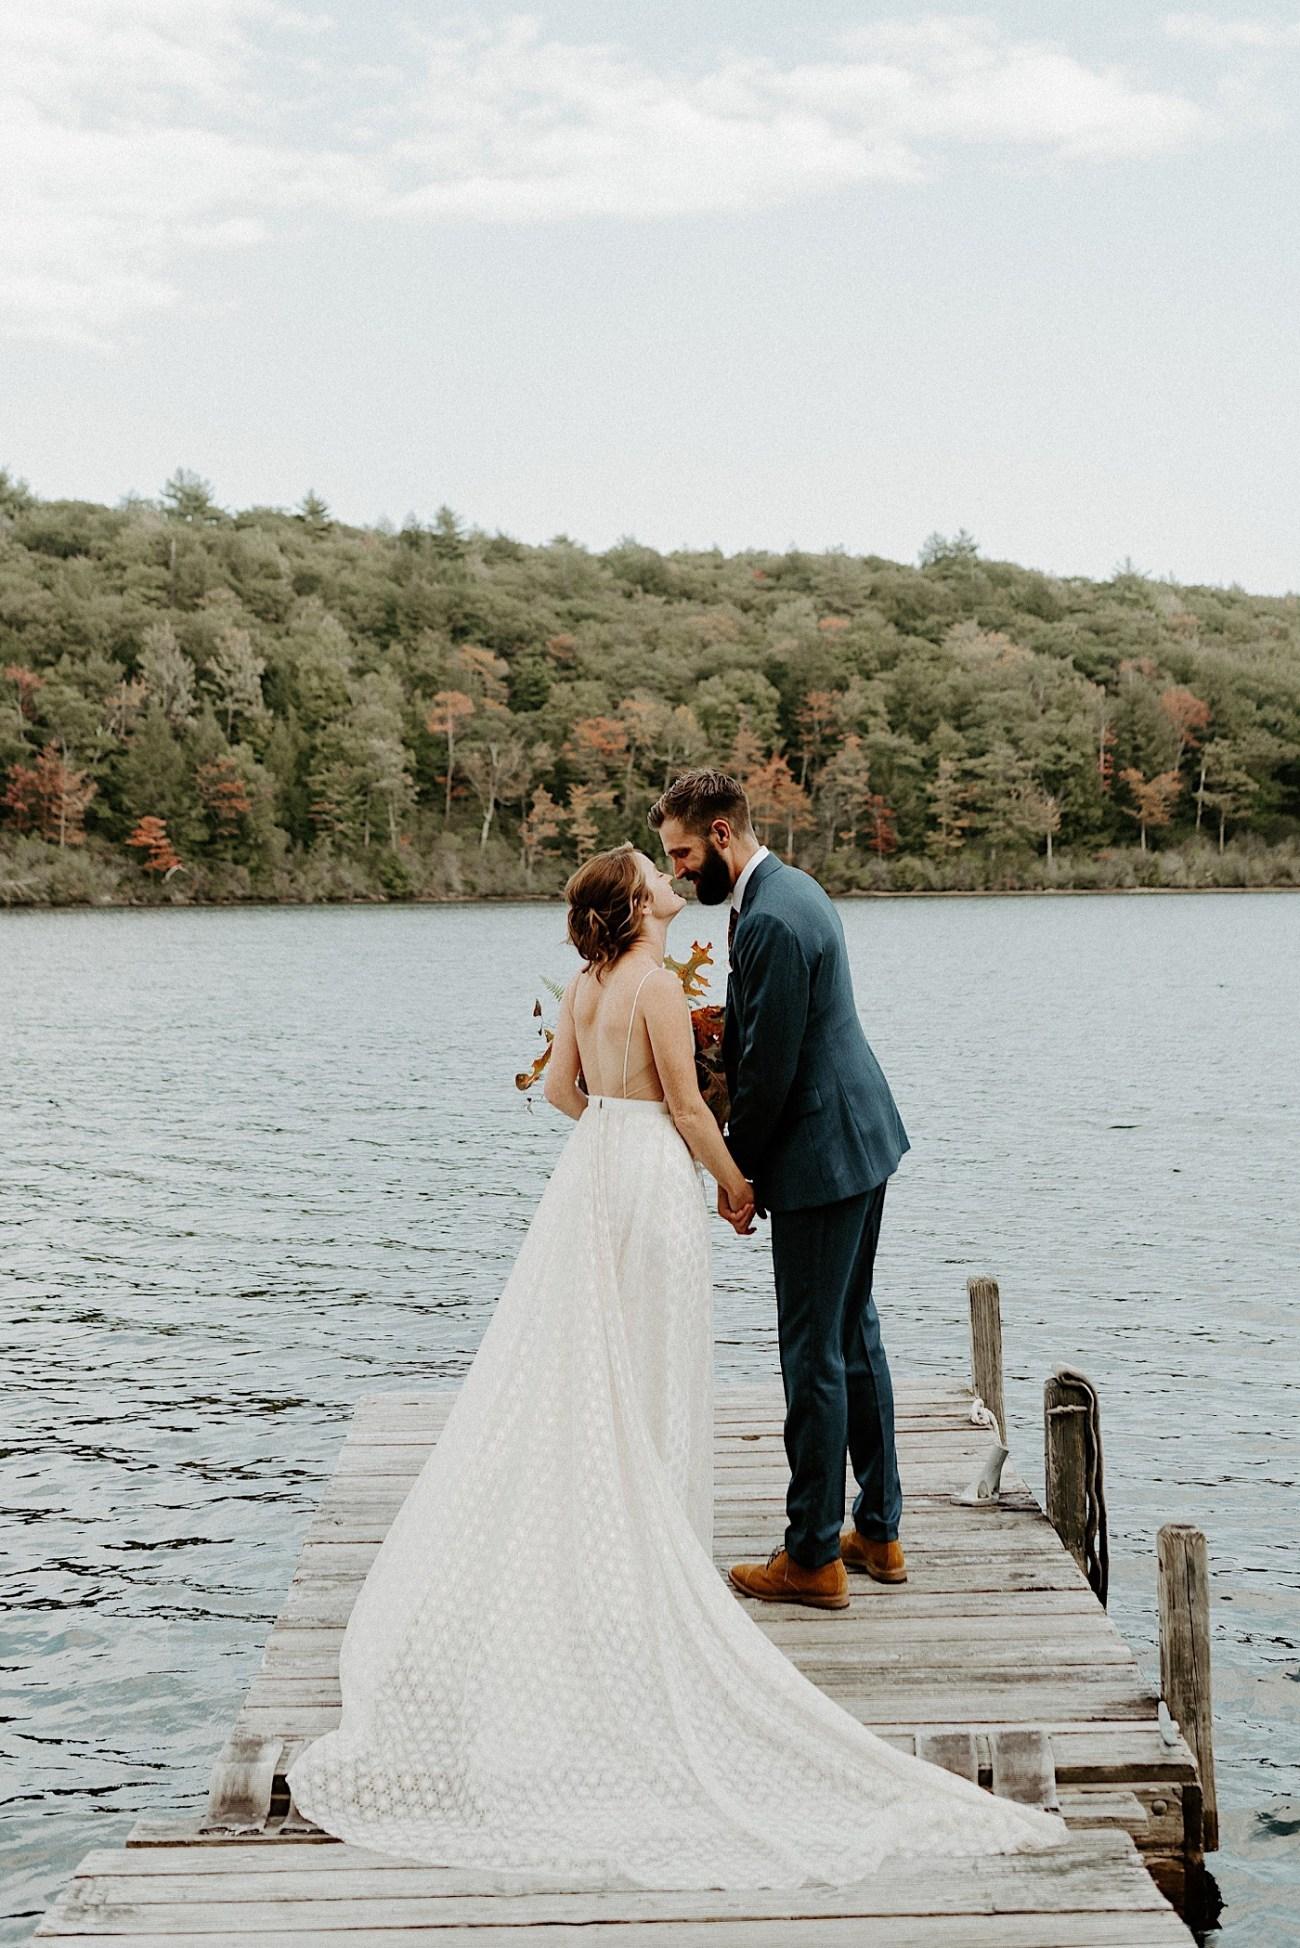 Destination Lakeside Wedding Mt Washington Wedding Outdoor Wedding Boston Wedding Photographer 035